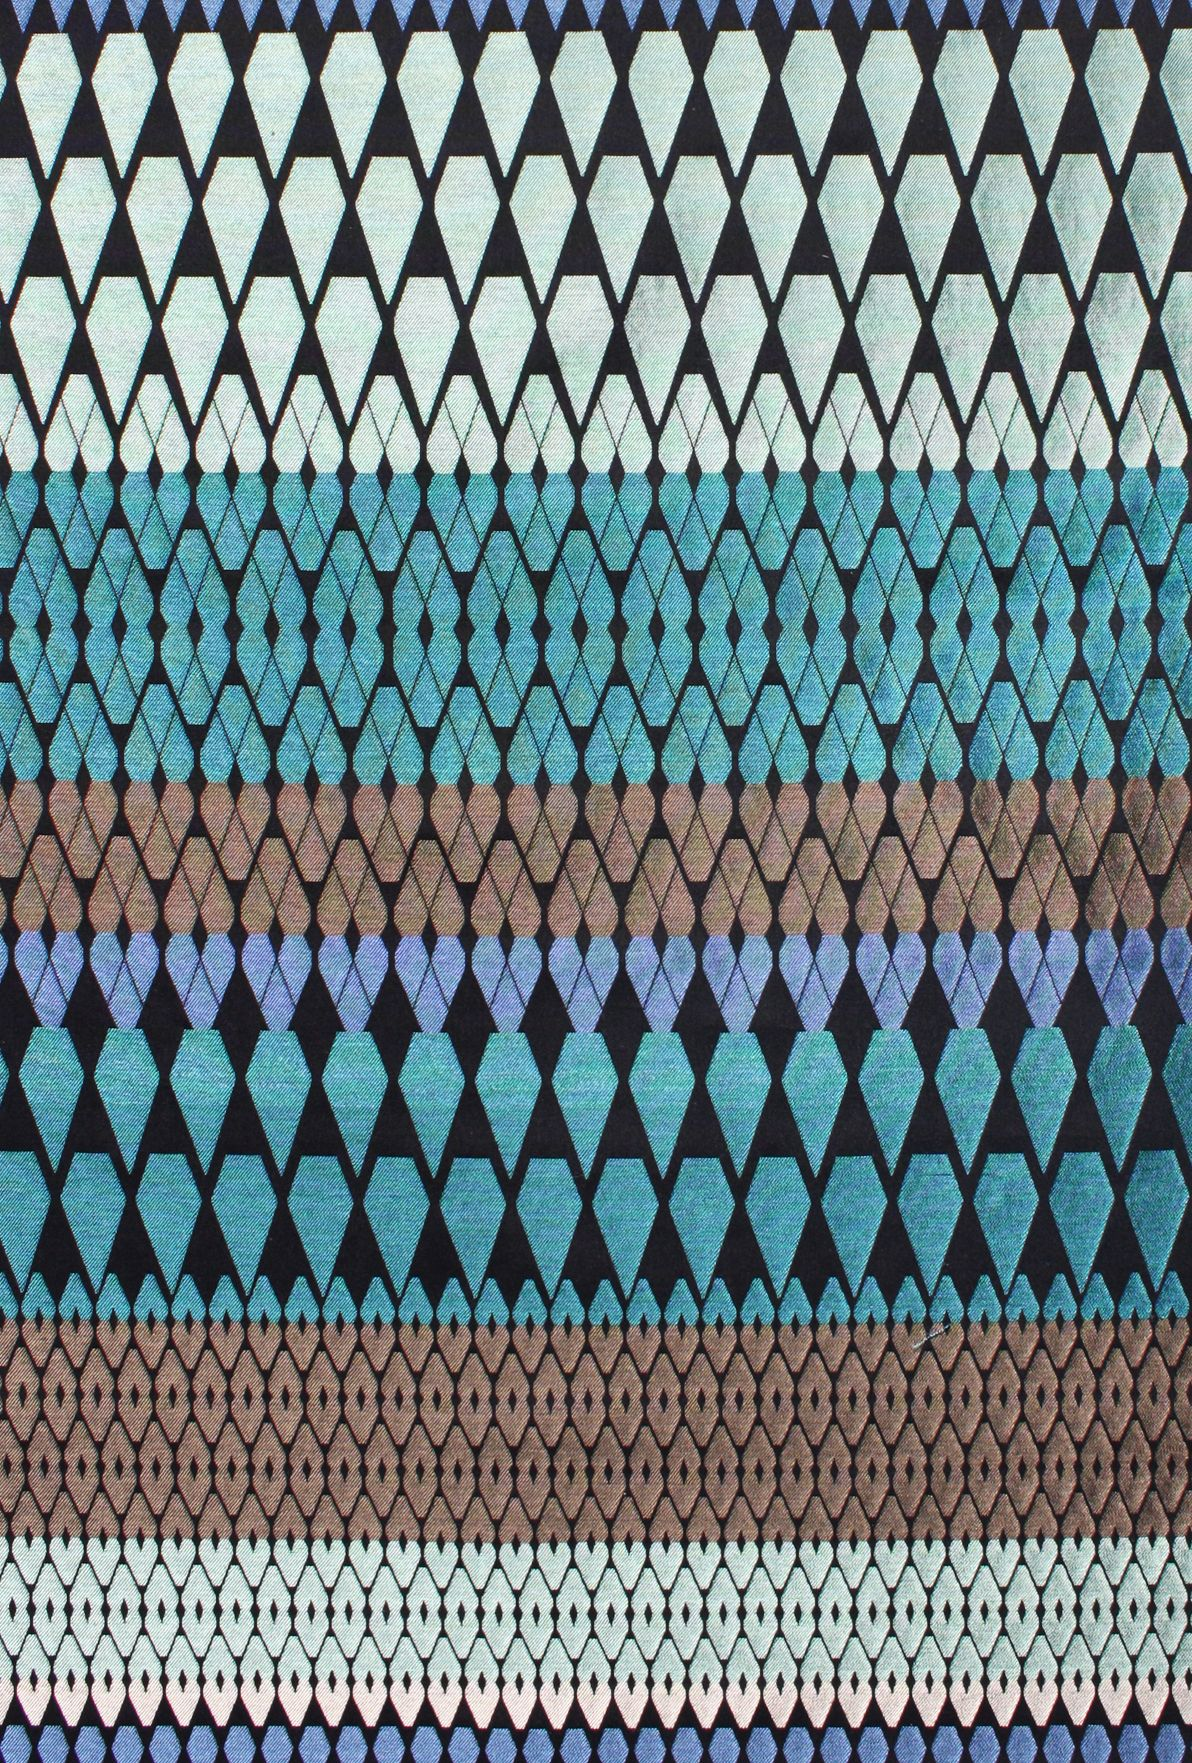 Woodbridge Upholstery. Furnishings. Cotton, Viscose Rayon, Spun Viscose. Margo Selby. Textile Design